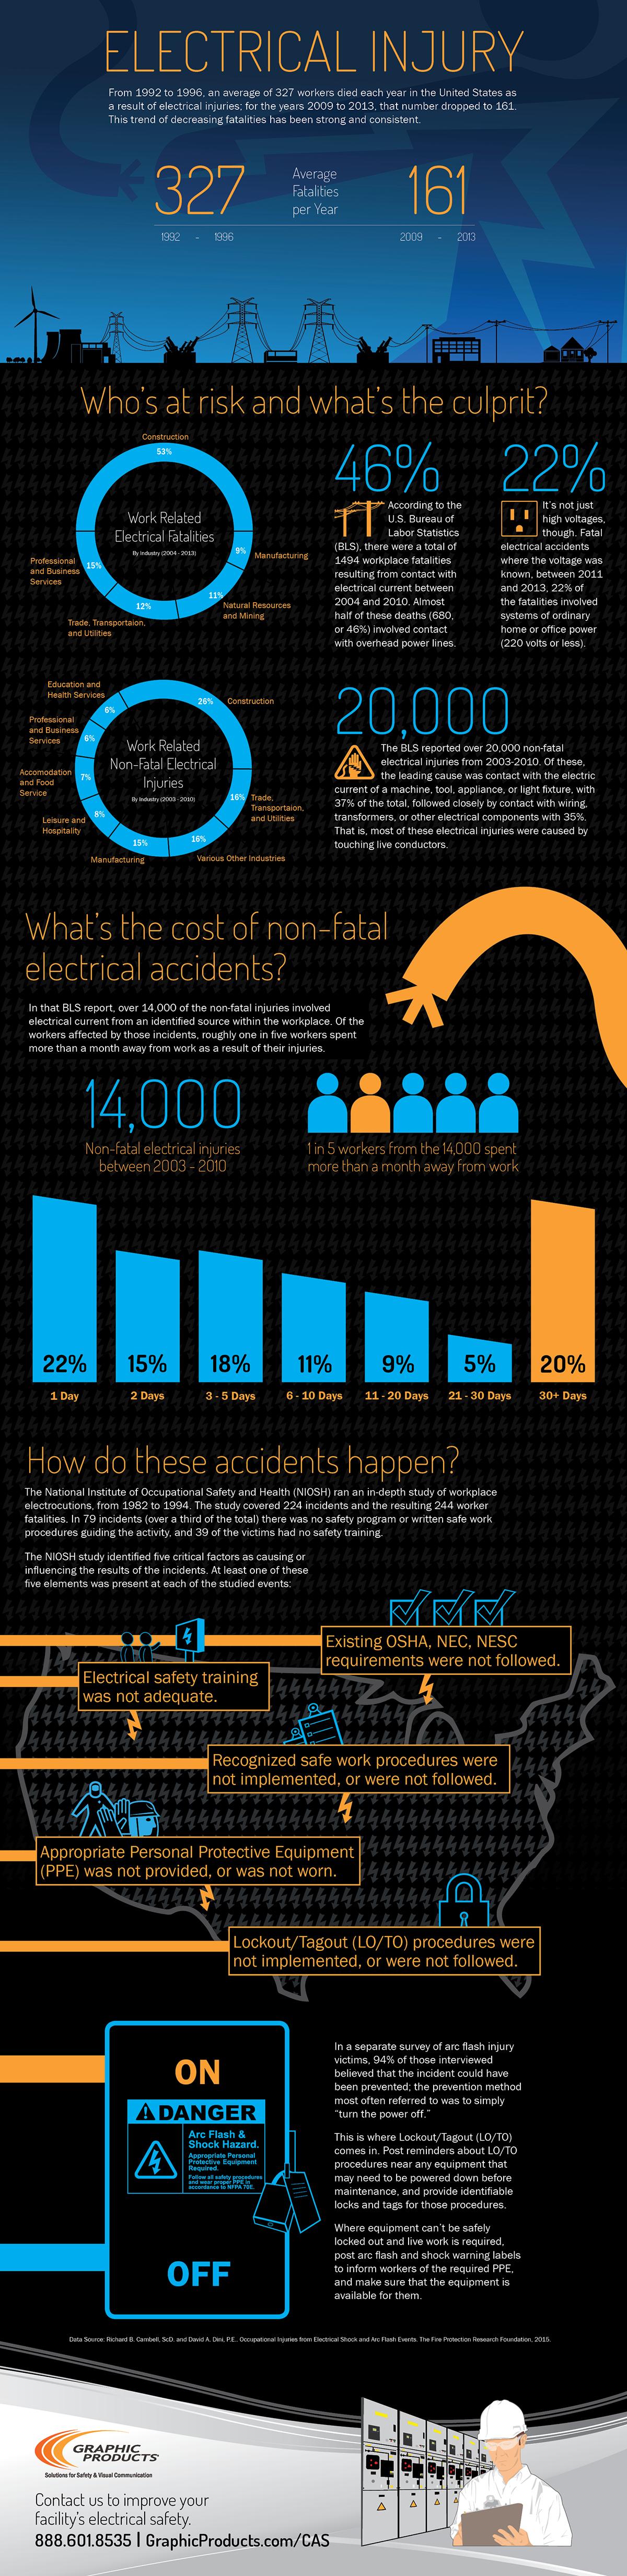 electrical-injury-2015-infographic.jpg